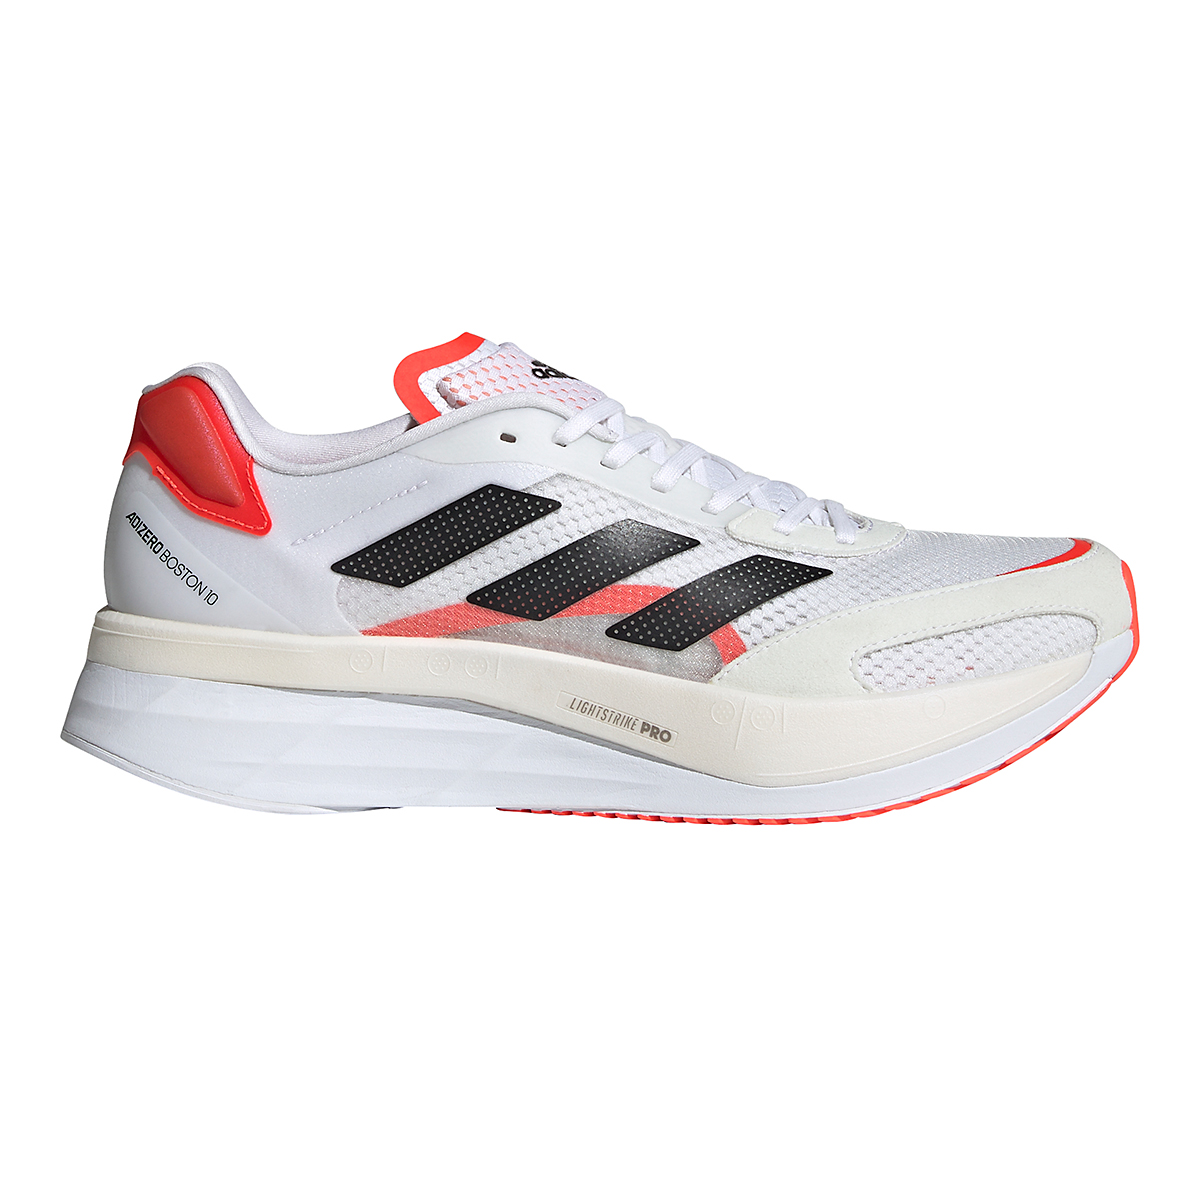 Men's Adidas Adizero Boston 10 Running Shoe - Color: Black/White/Solar Red - Size: 7 - Width: Regular, Black/White/Solar Red, large, image 1